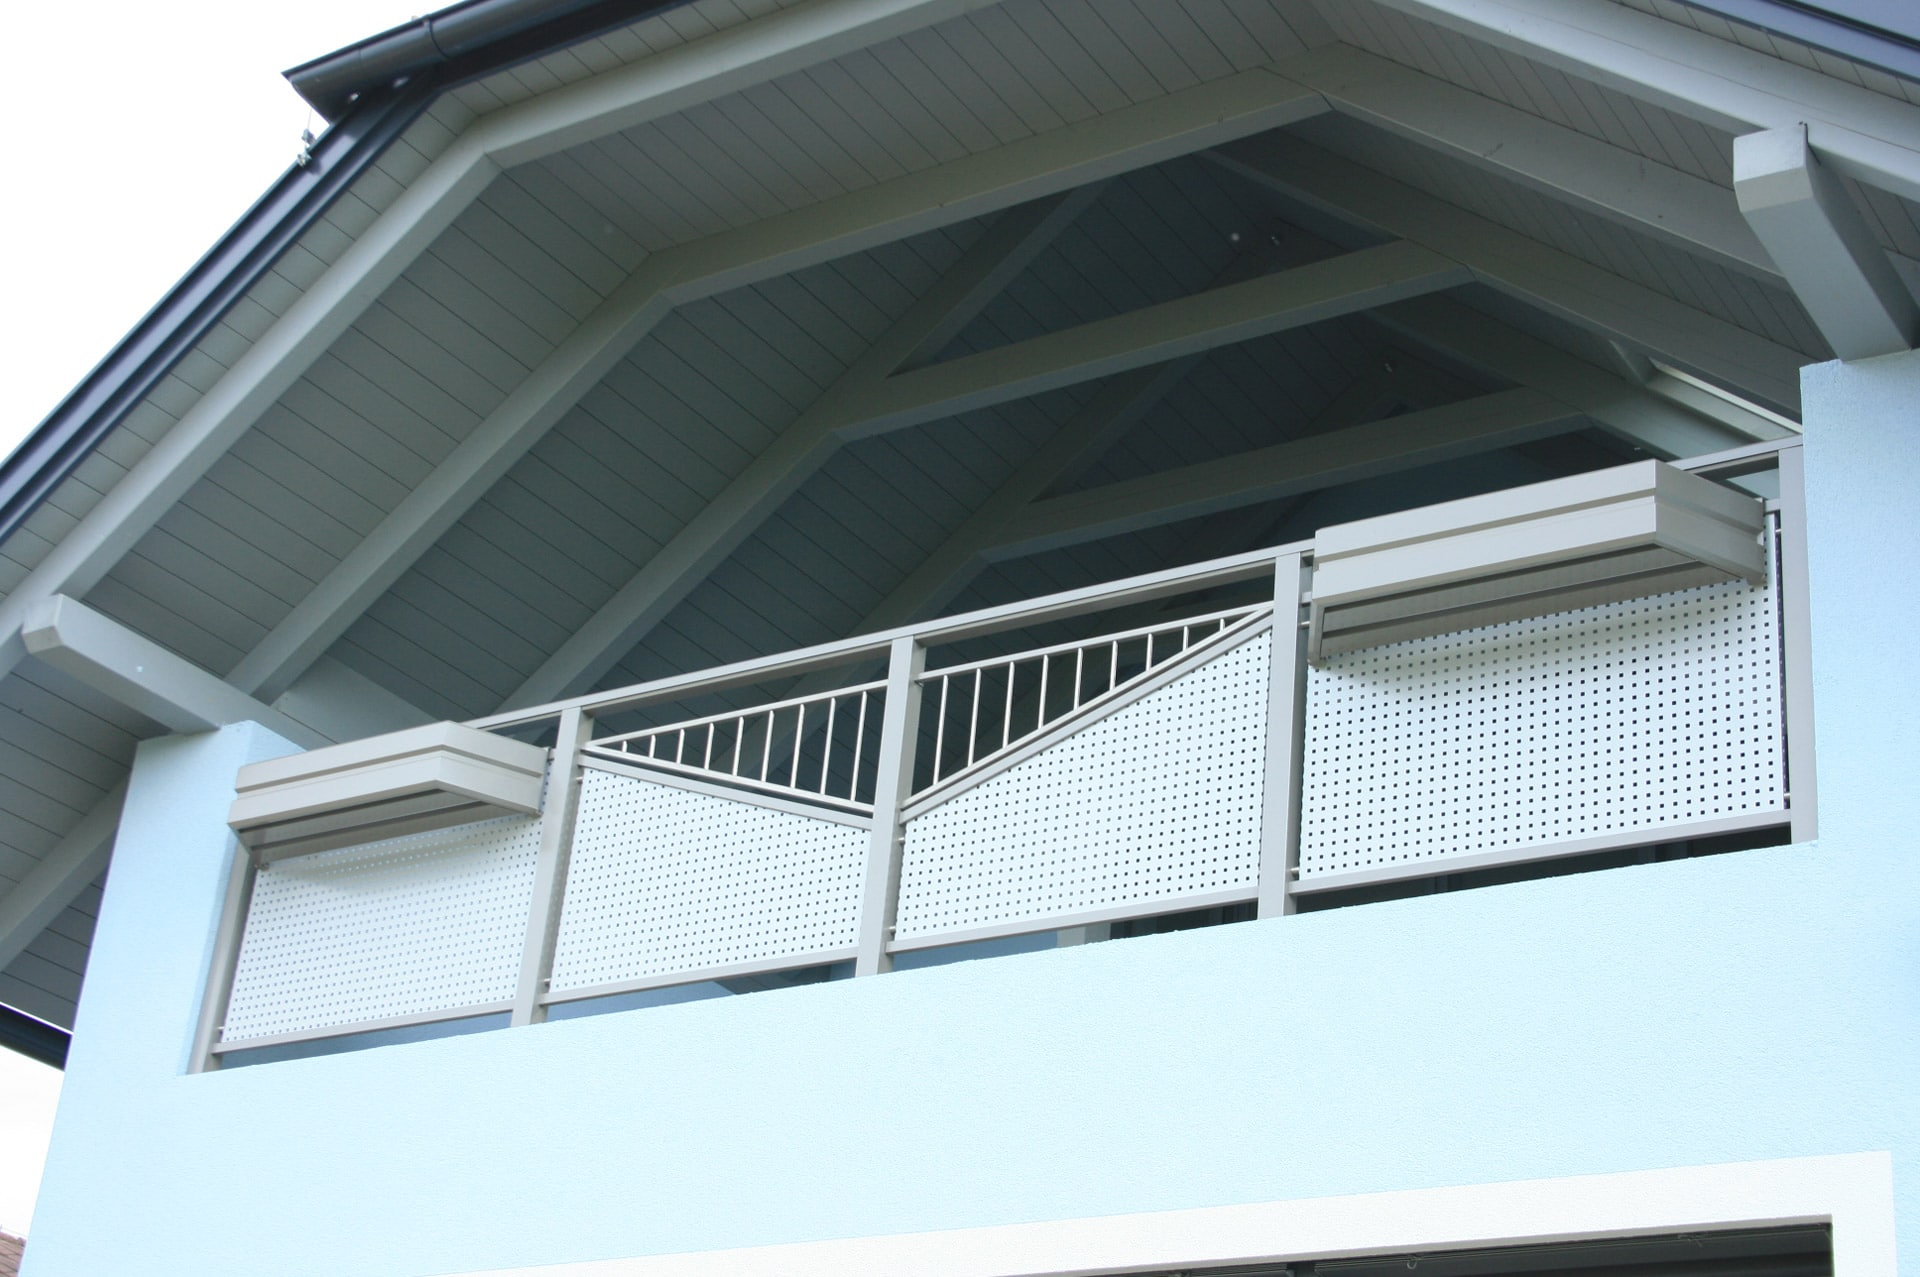 Bruck 02 b |graues Aluminium-Geländer mit Lobchblech bei Balkon im Giebel bei Walmdach | Svoboda